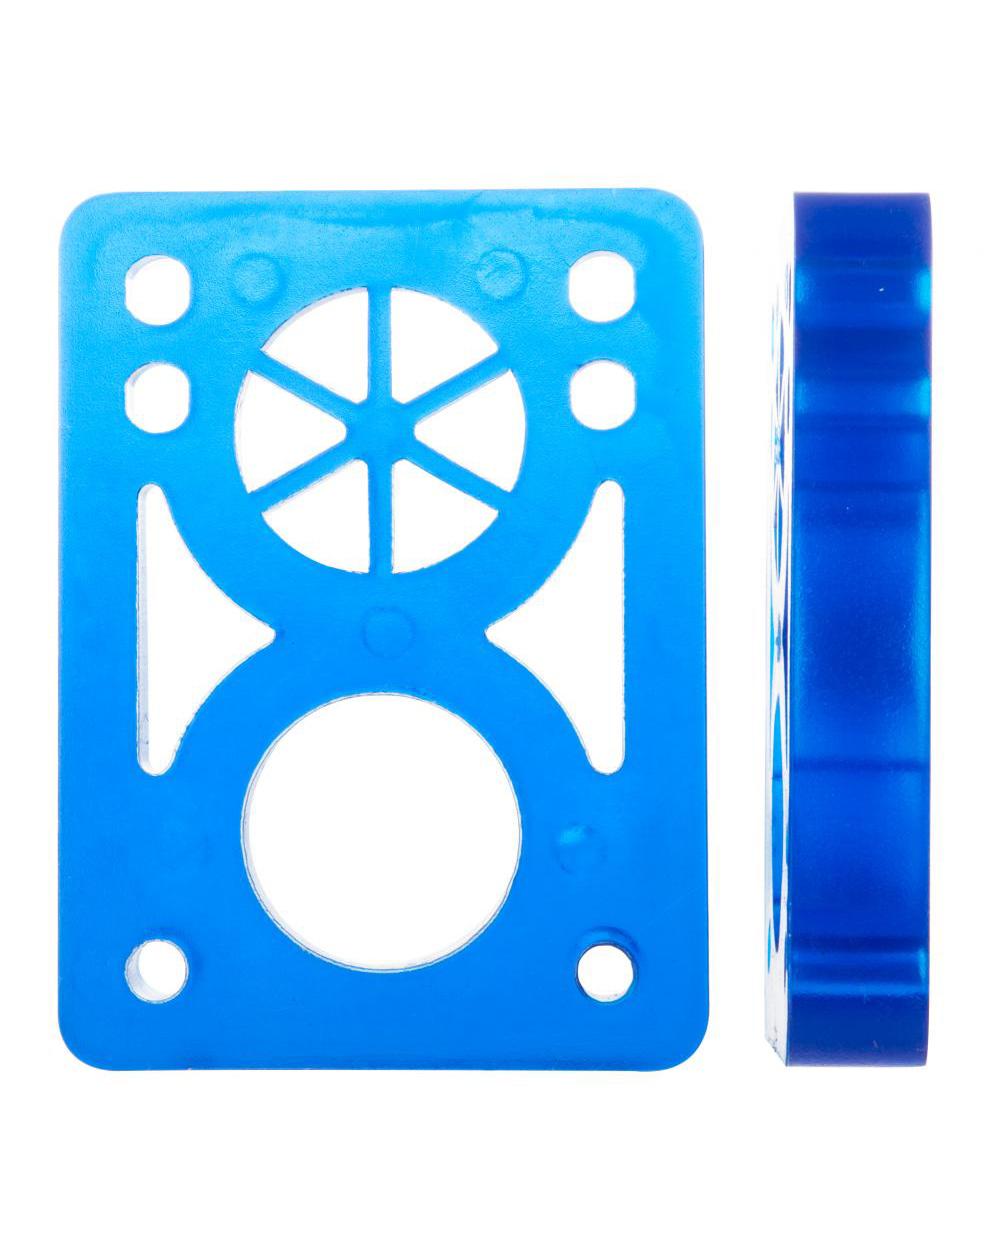 D-Street Pads Skateboard Soft 1/2-inch Clear Blue 2 pc